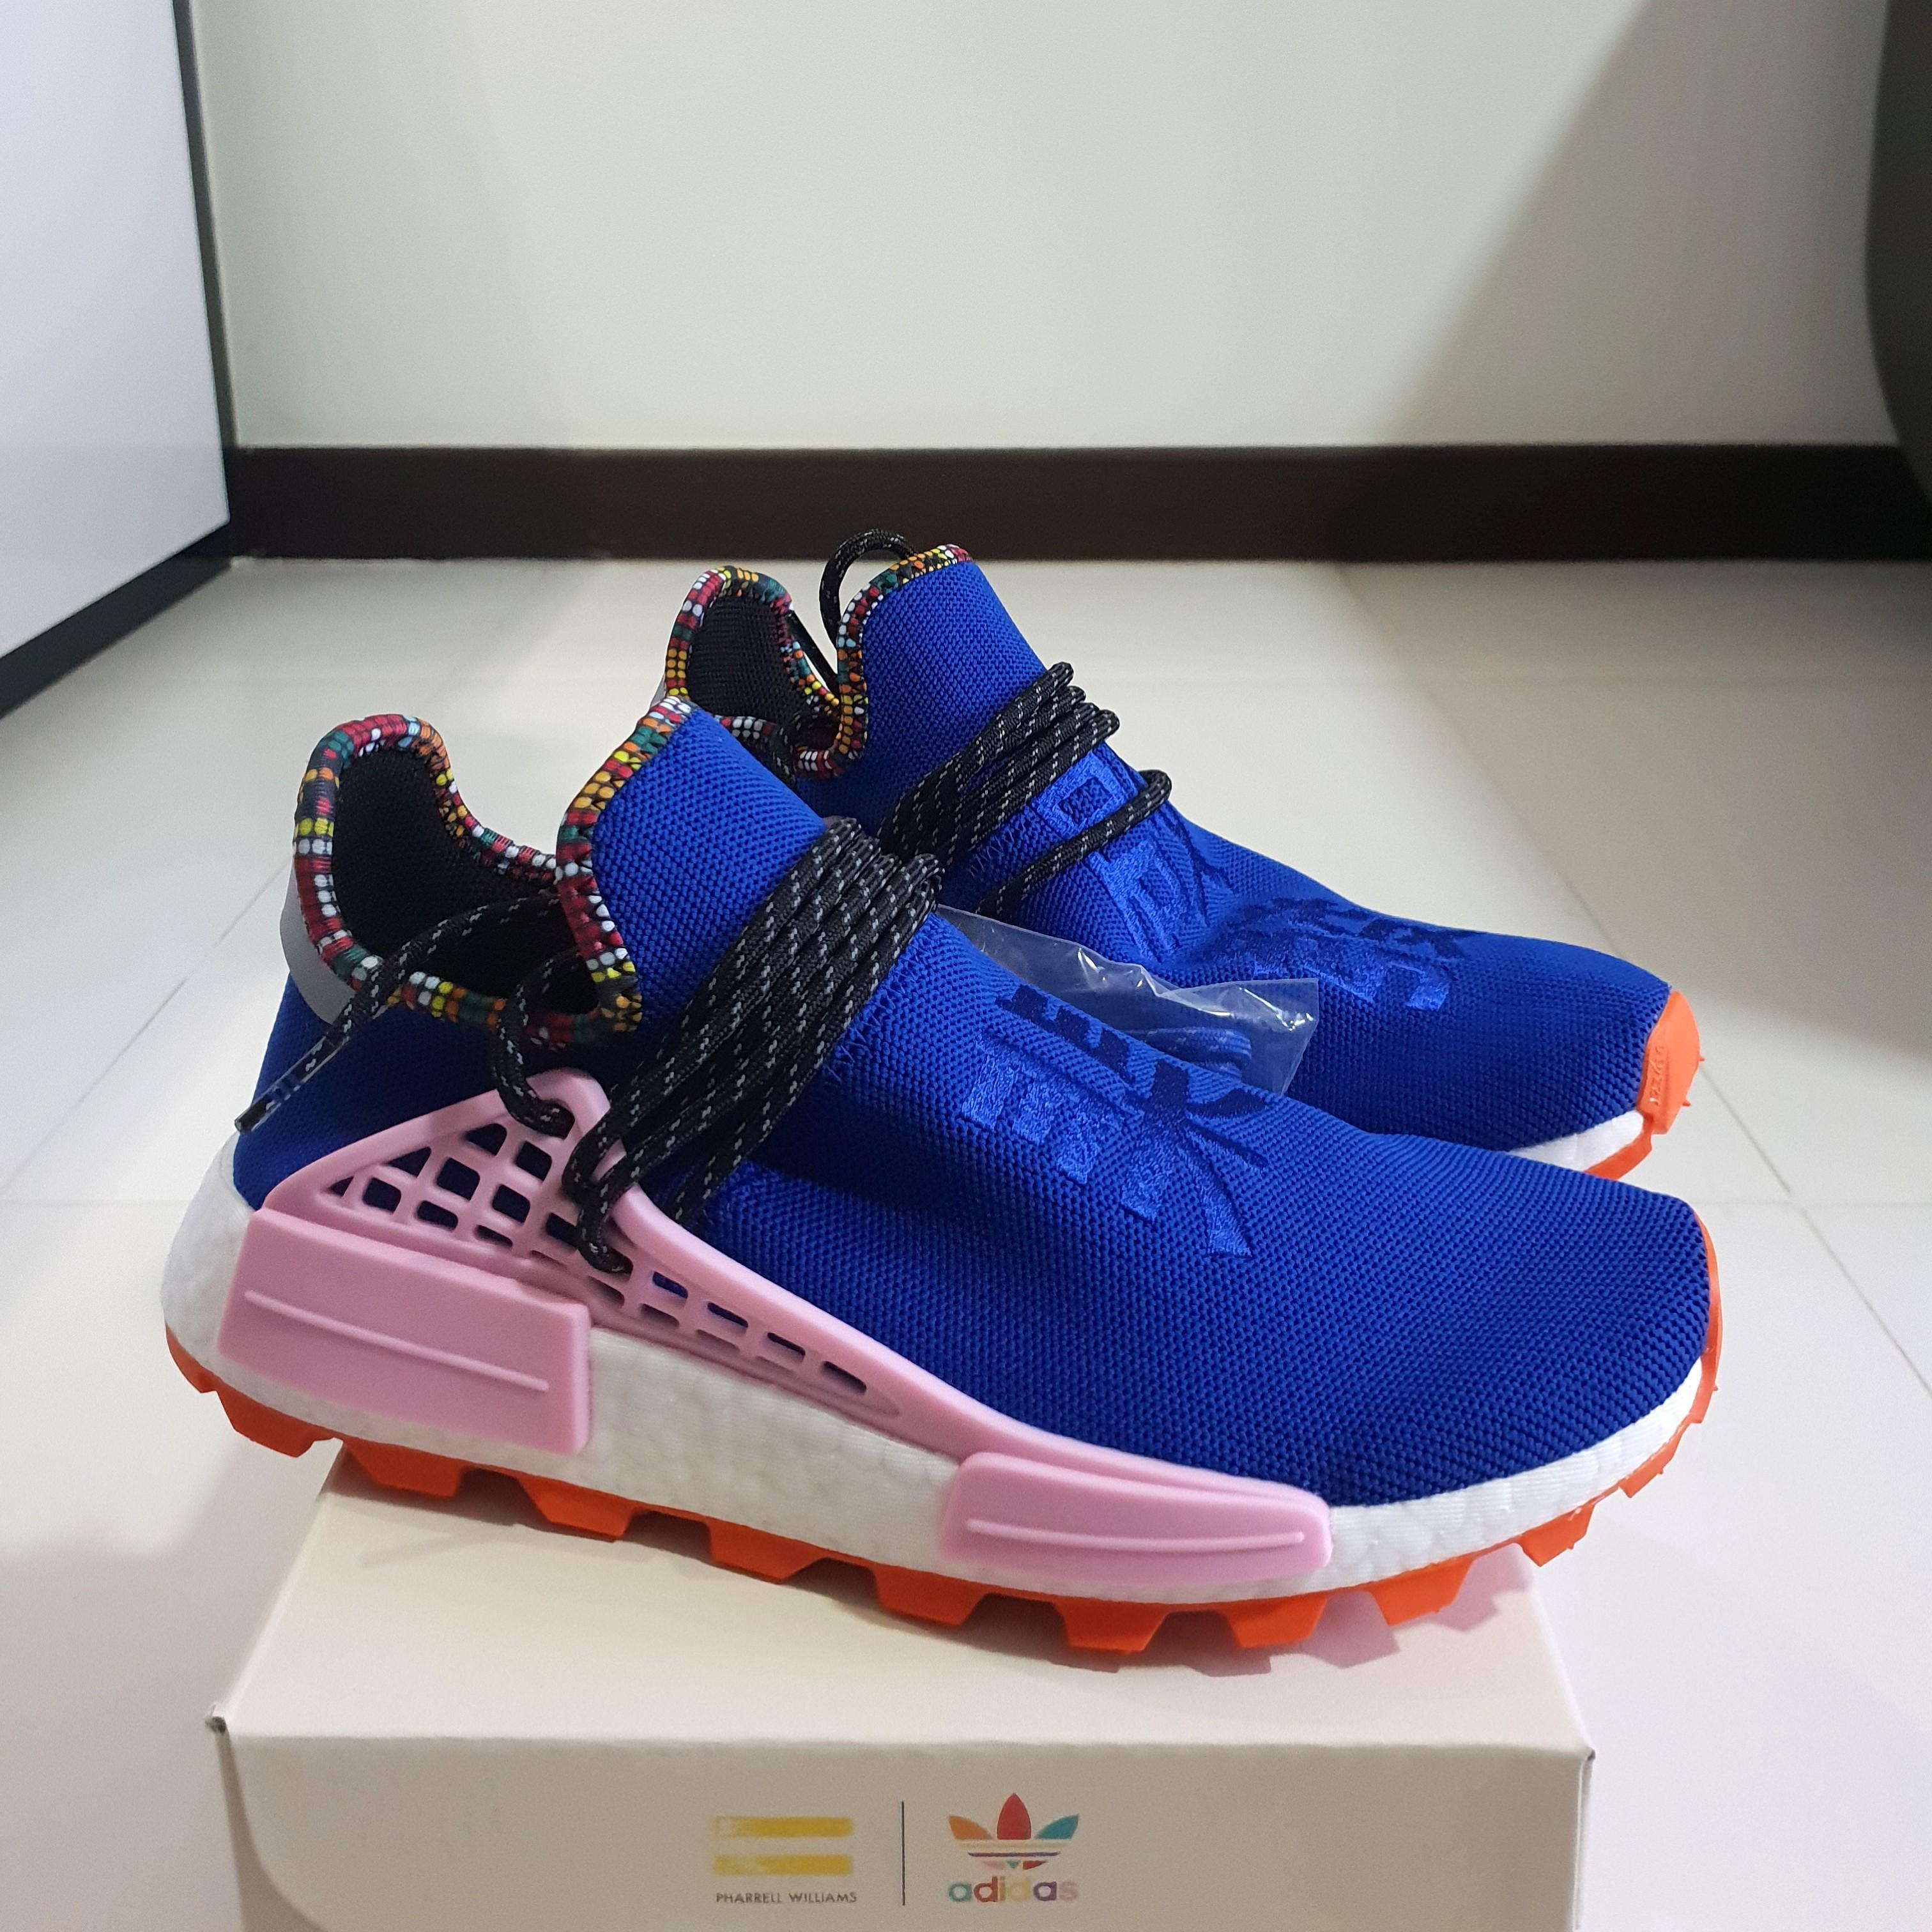 brand new 365dd 632ea Adidas NMD Pharrell Williams PW Human Race Powder Blue ...